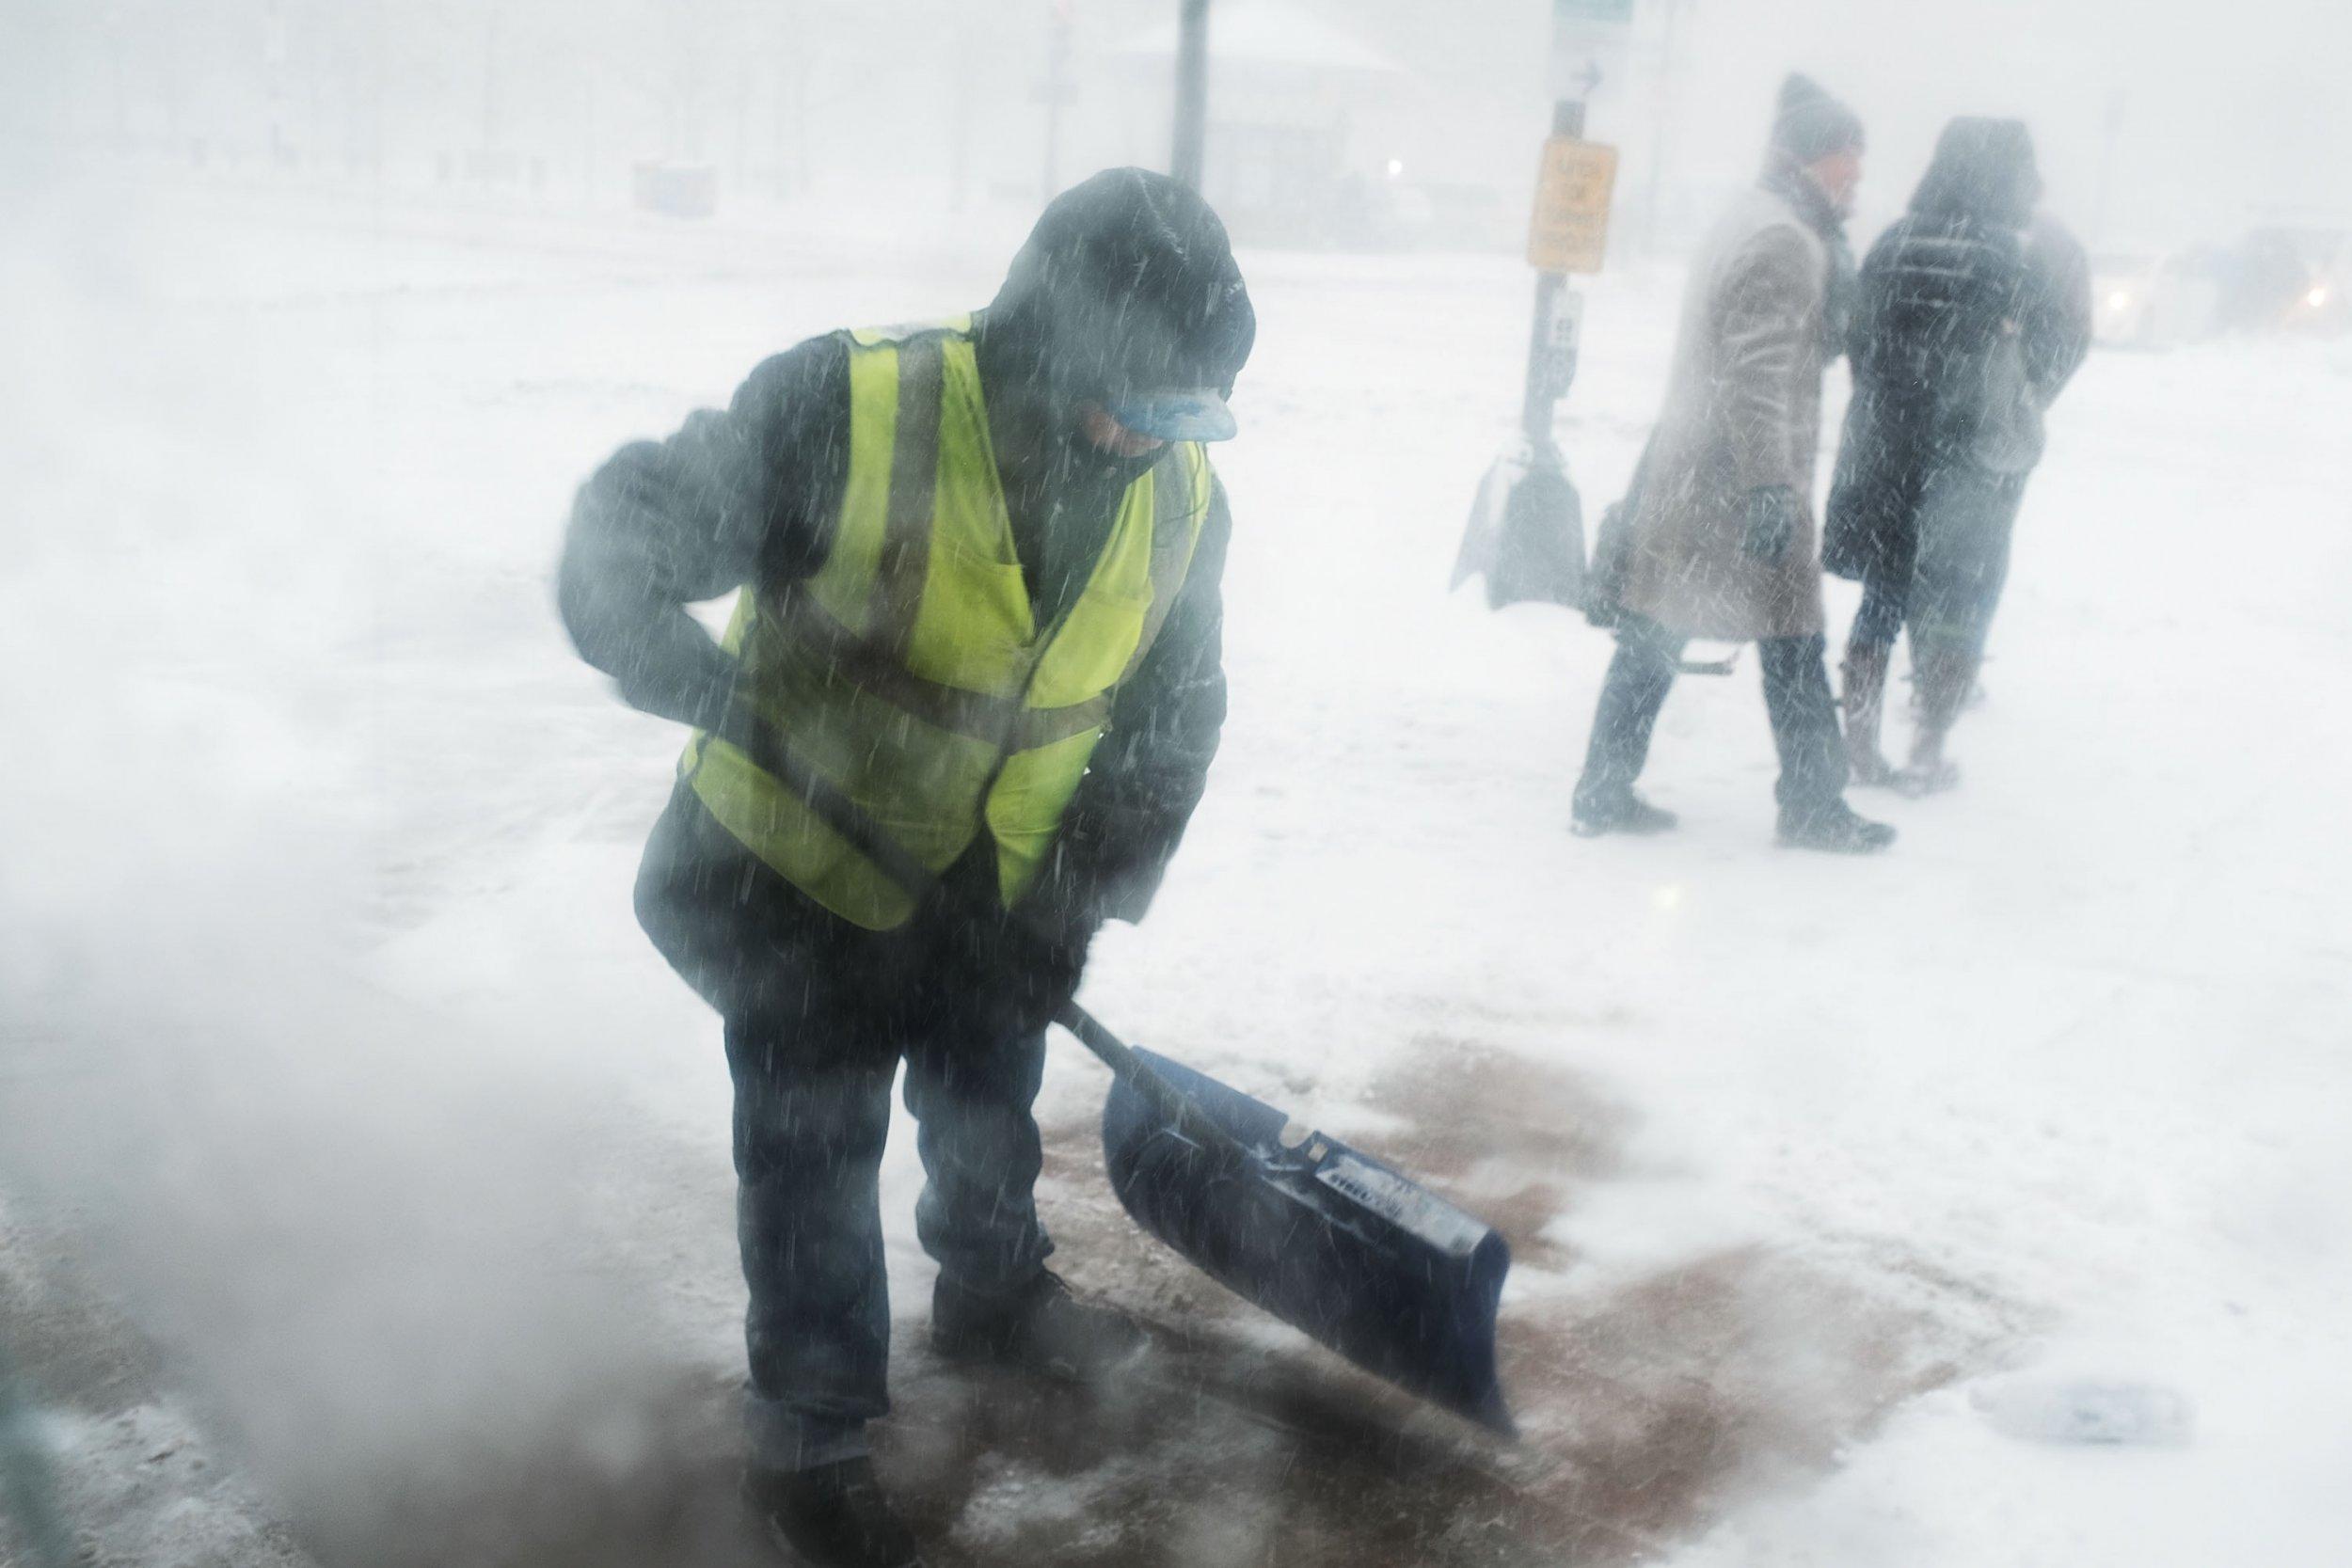 01_04_snowfall_winter_storm